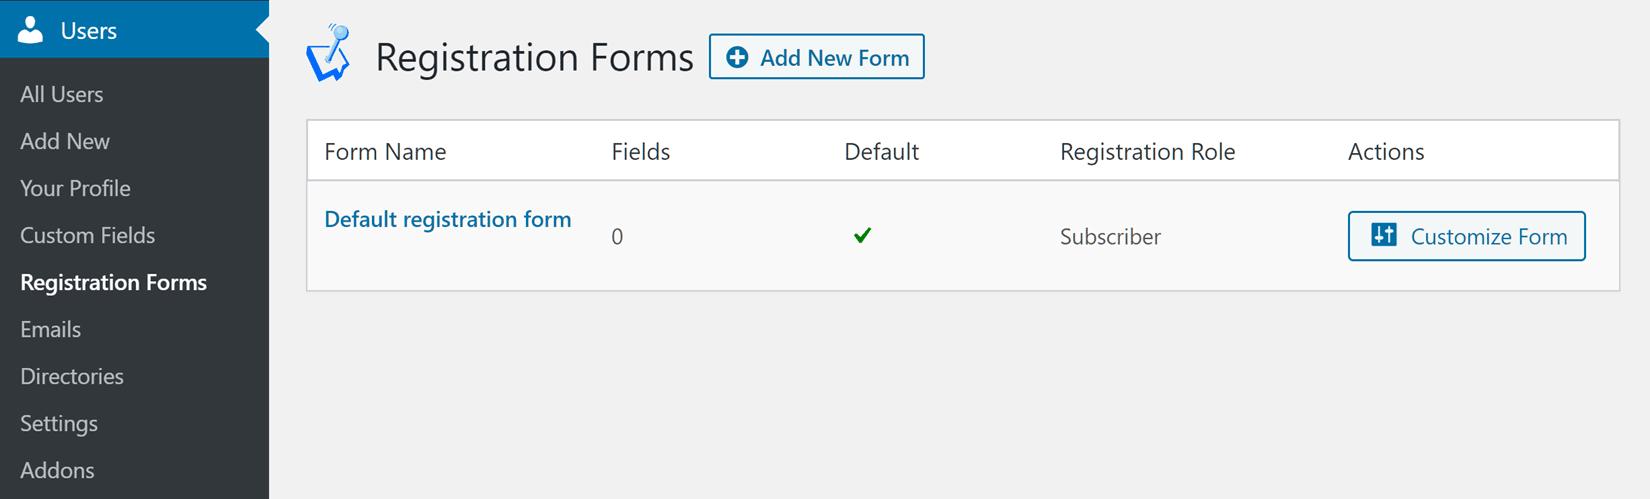 List of Registration Forms